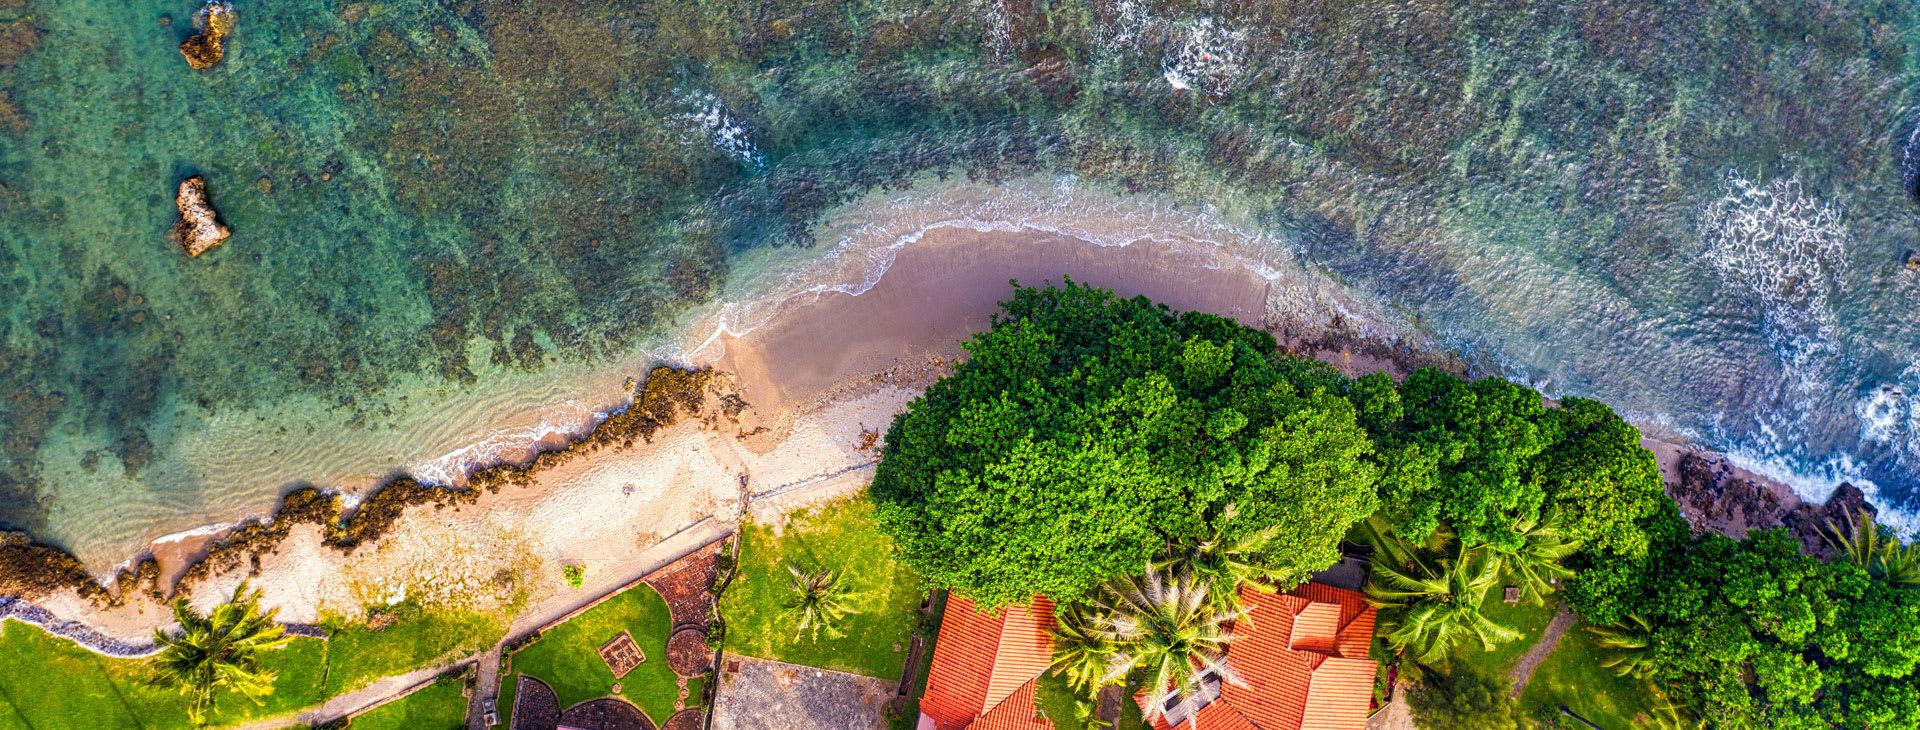 Beach Indonesia aerial view